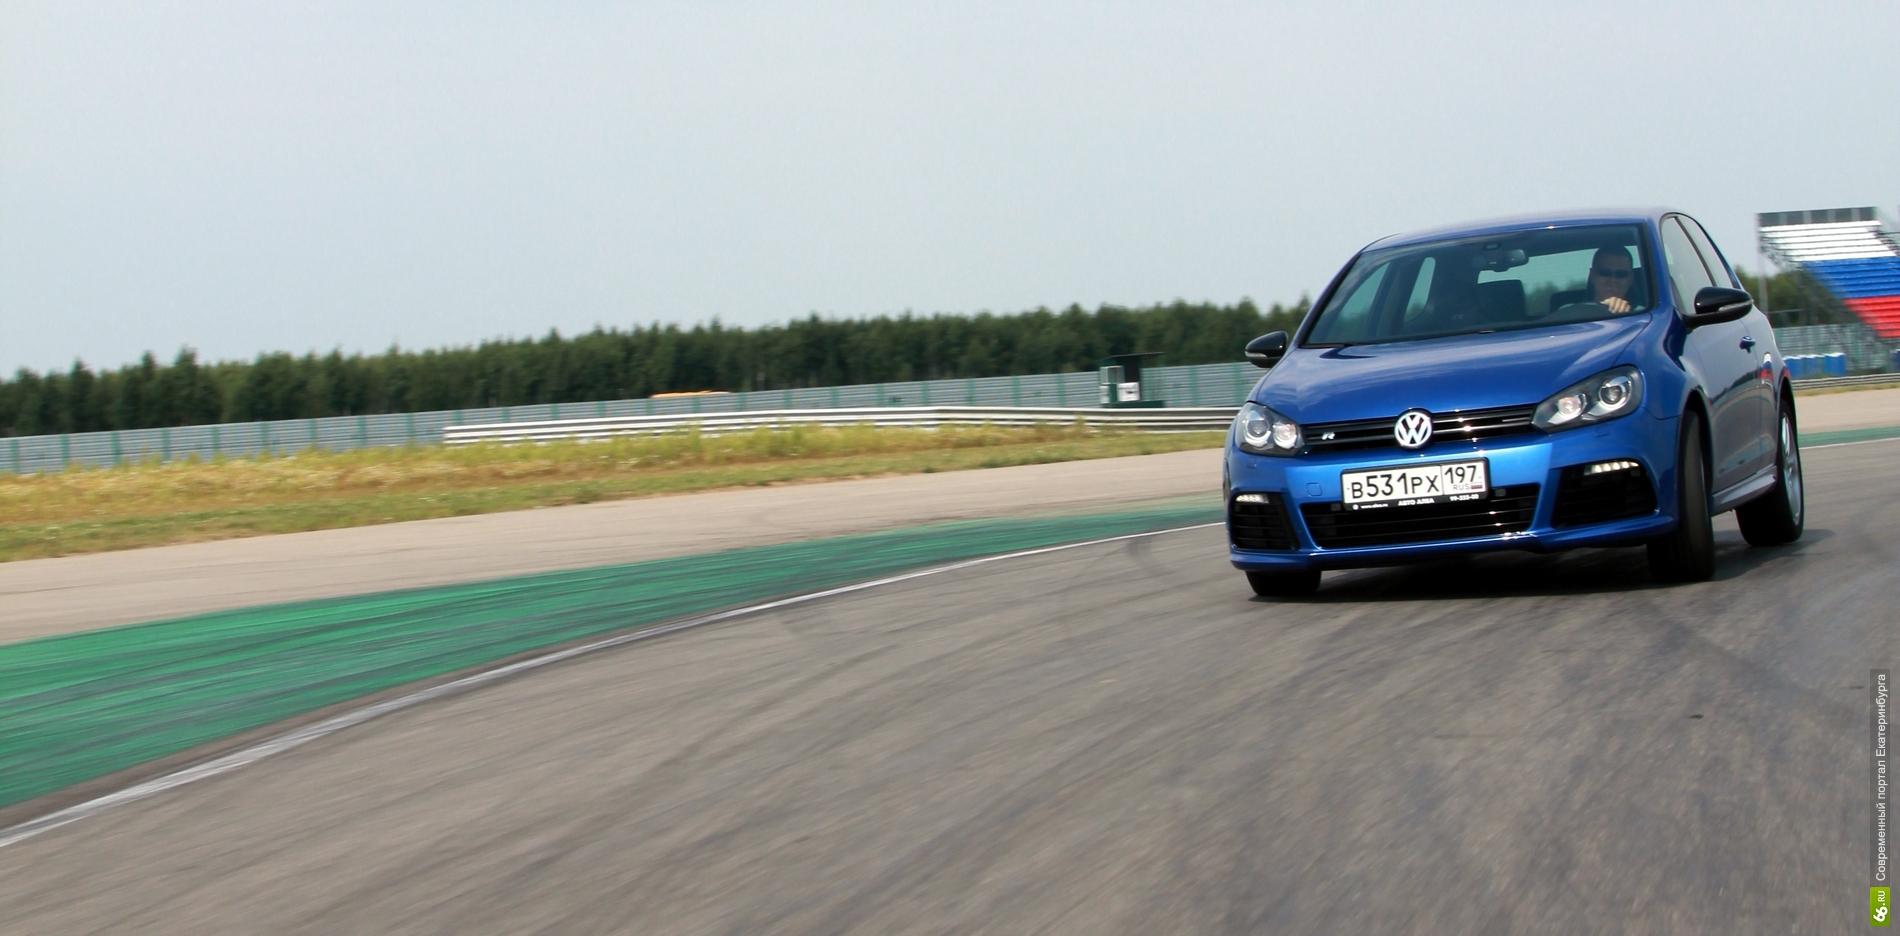 Тест-драйвы 66.ru на радиоволнах: Volkswagen Golf R